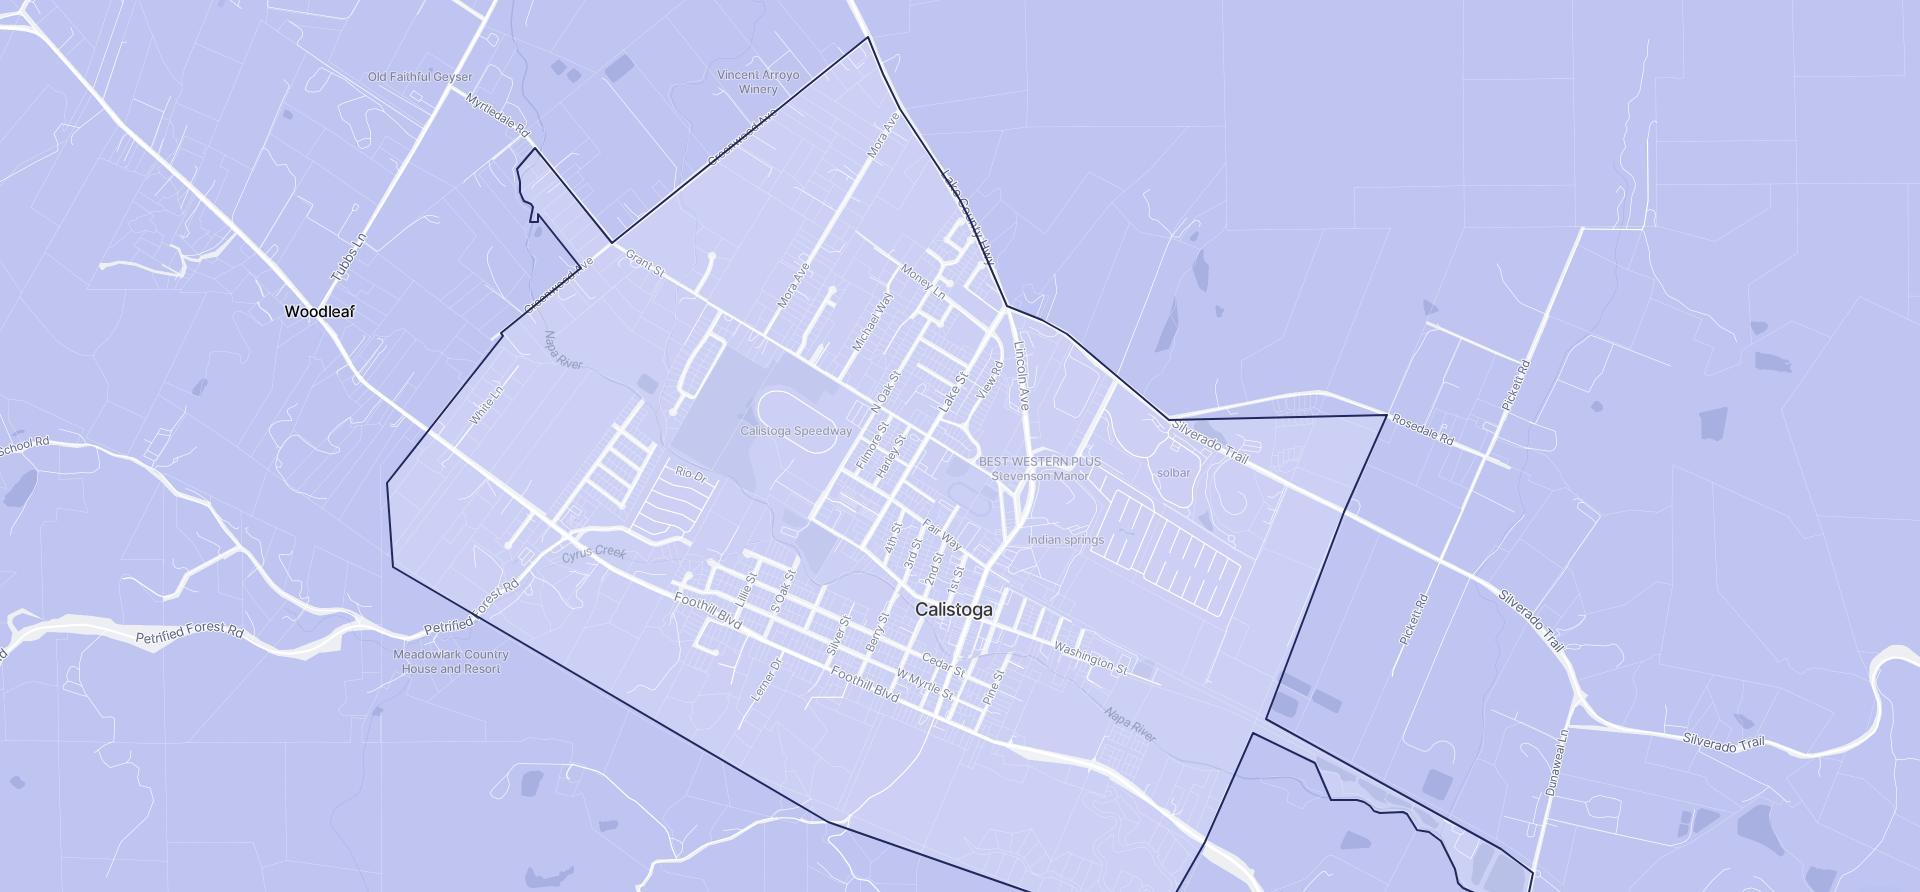 Image of Calistoga boundaries on a map.